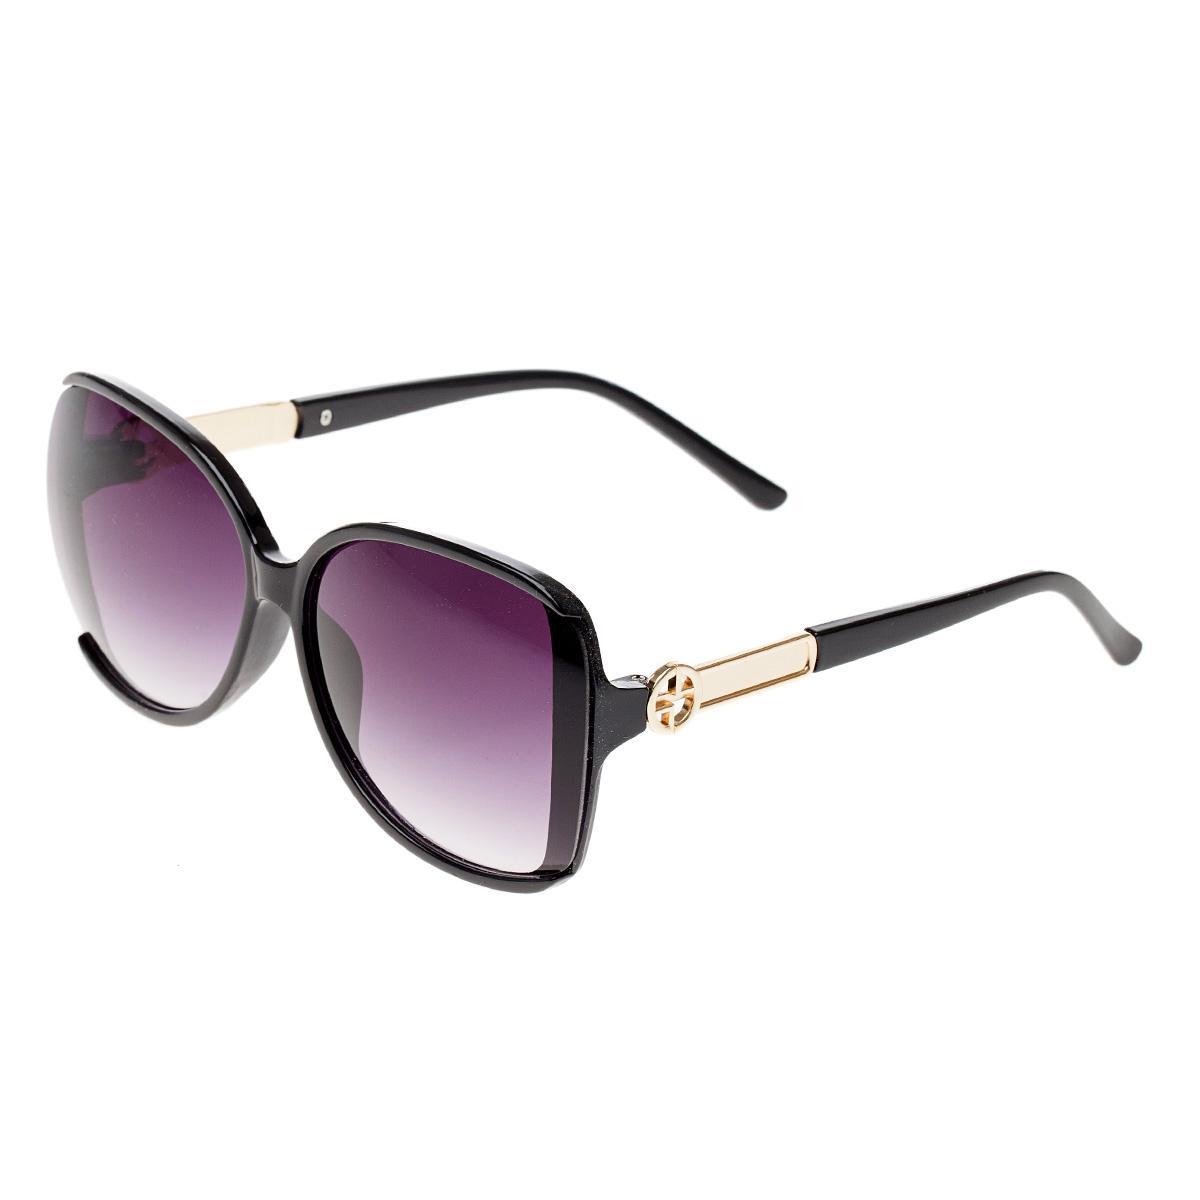 Фото - Очки солнцезащитные Sevenext, 23032-57 очки солнцезащитные sevenext 23032 28